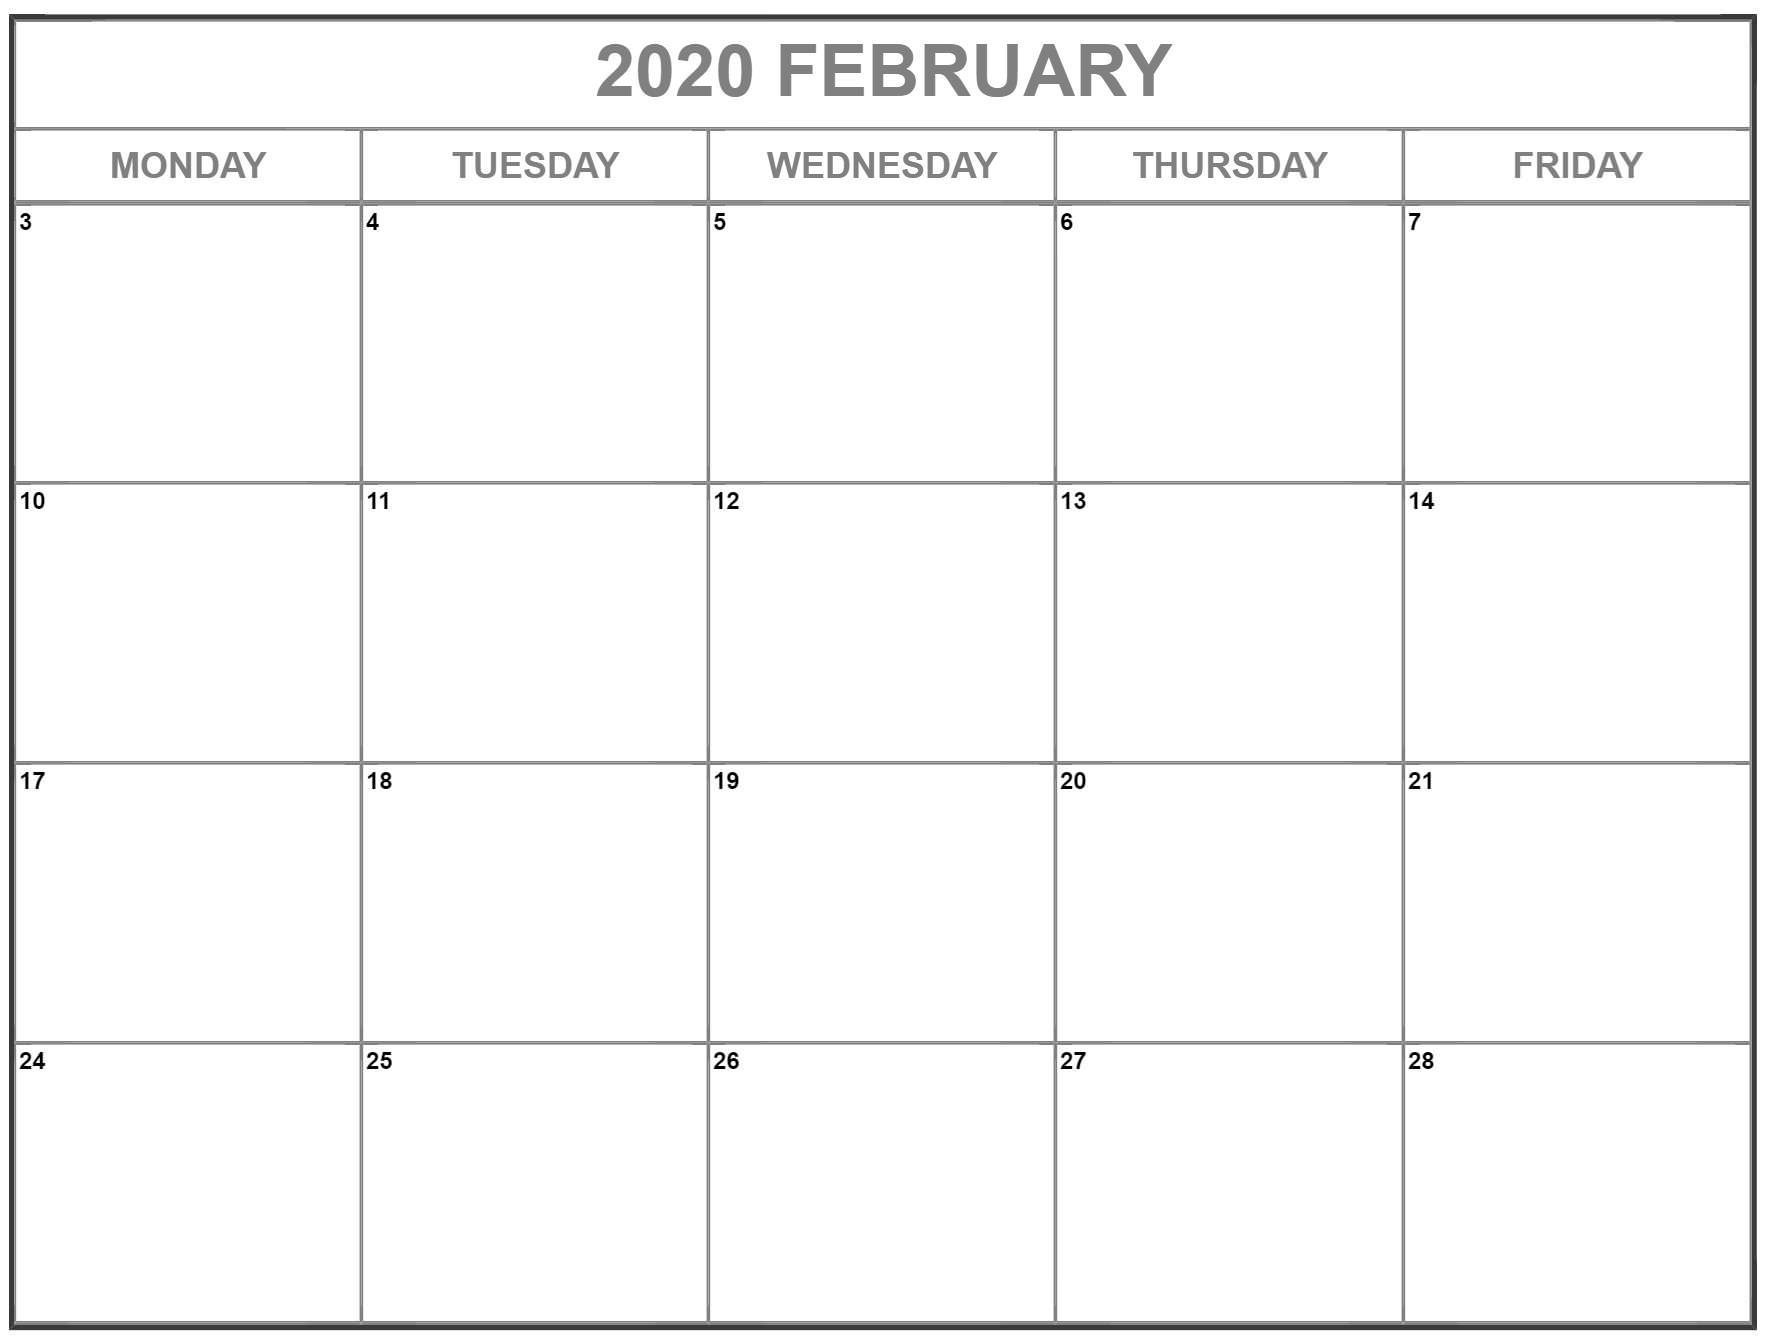 February 2020 Monday Calendar | Monday To Sunday Monday Through Friday Calendar